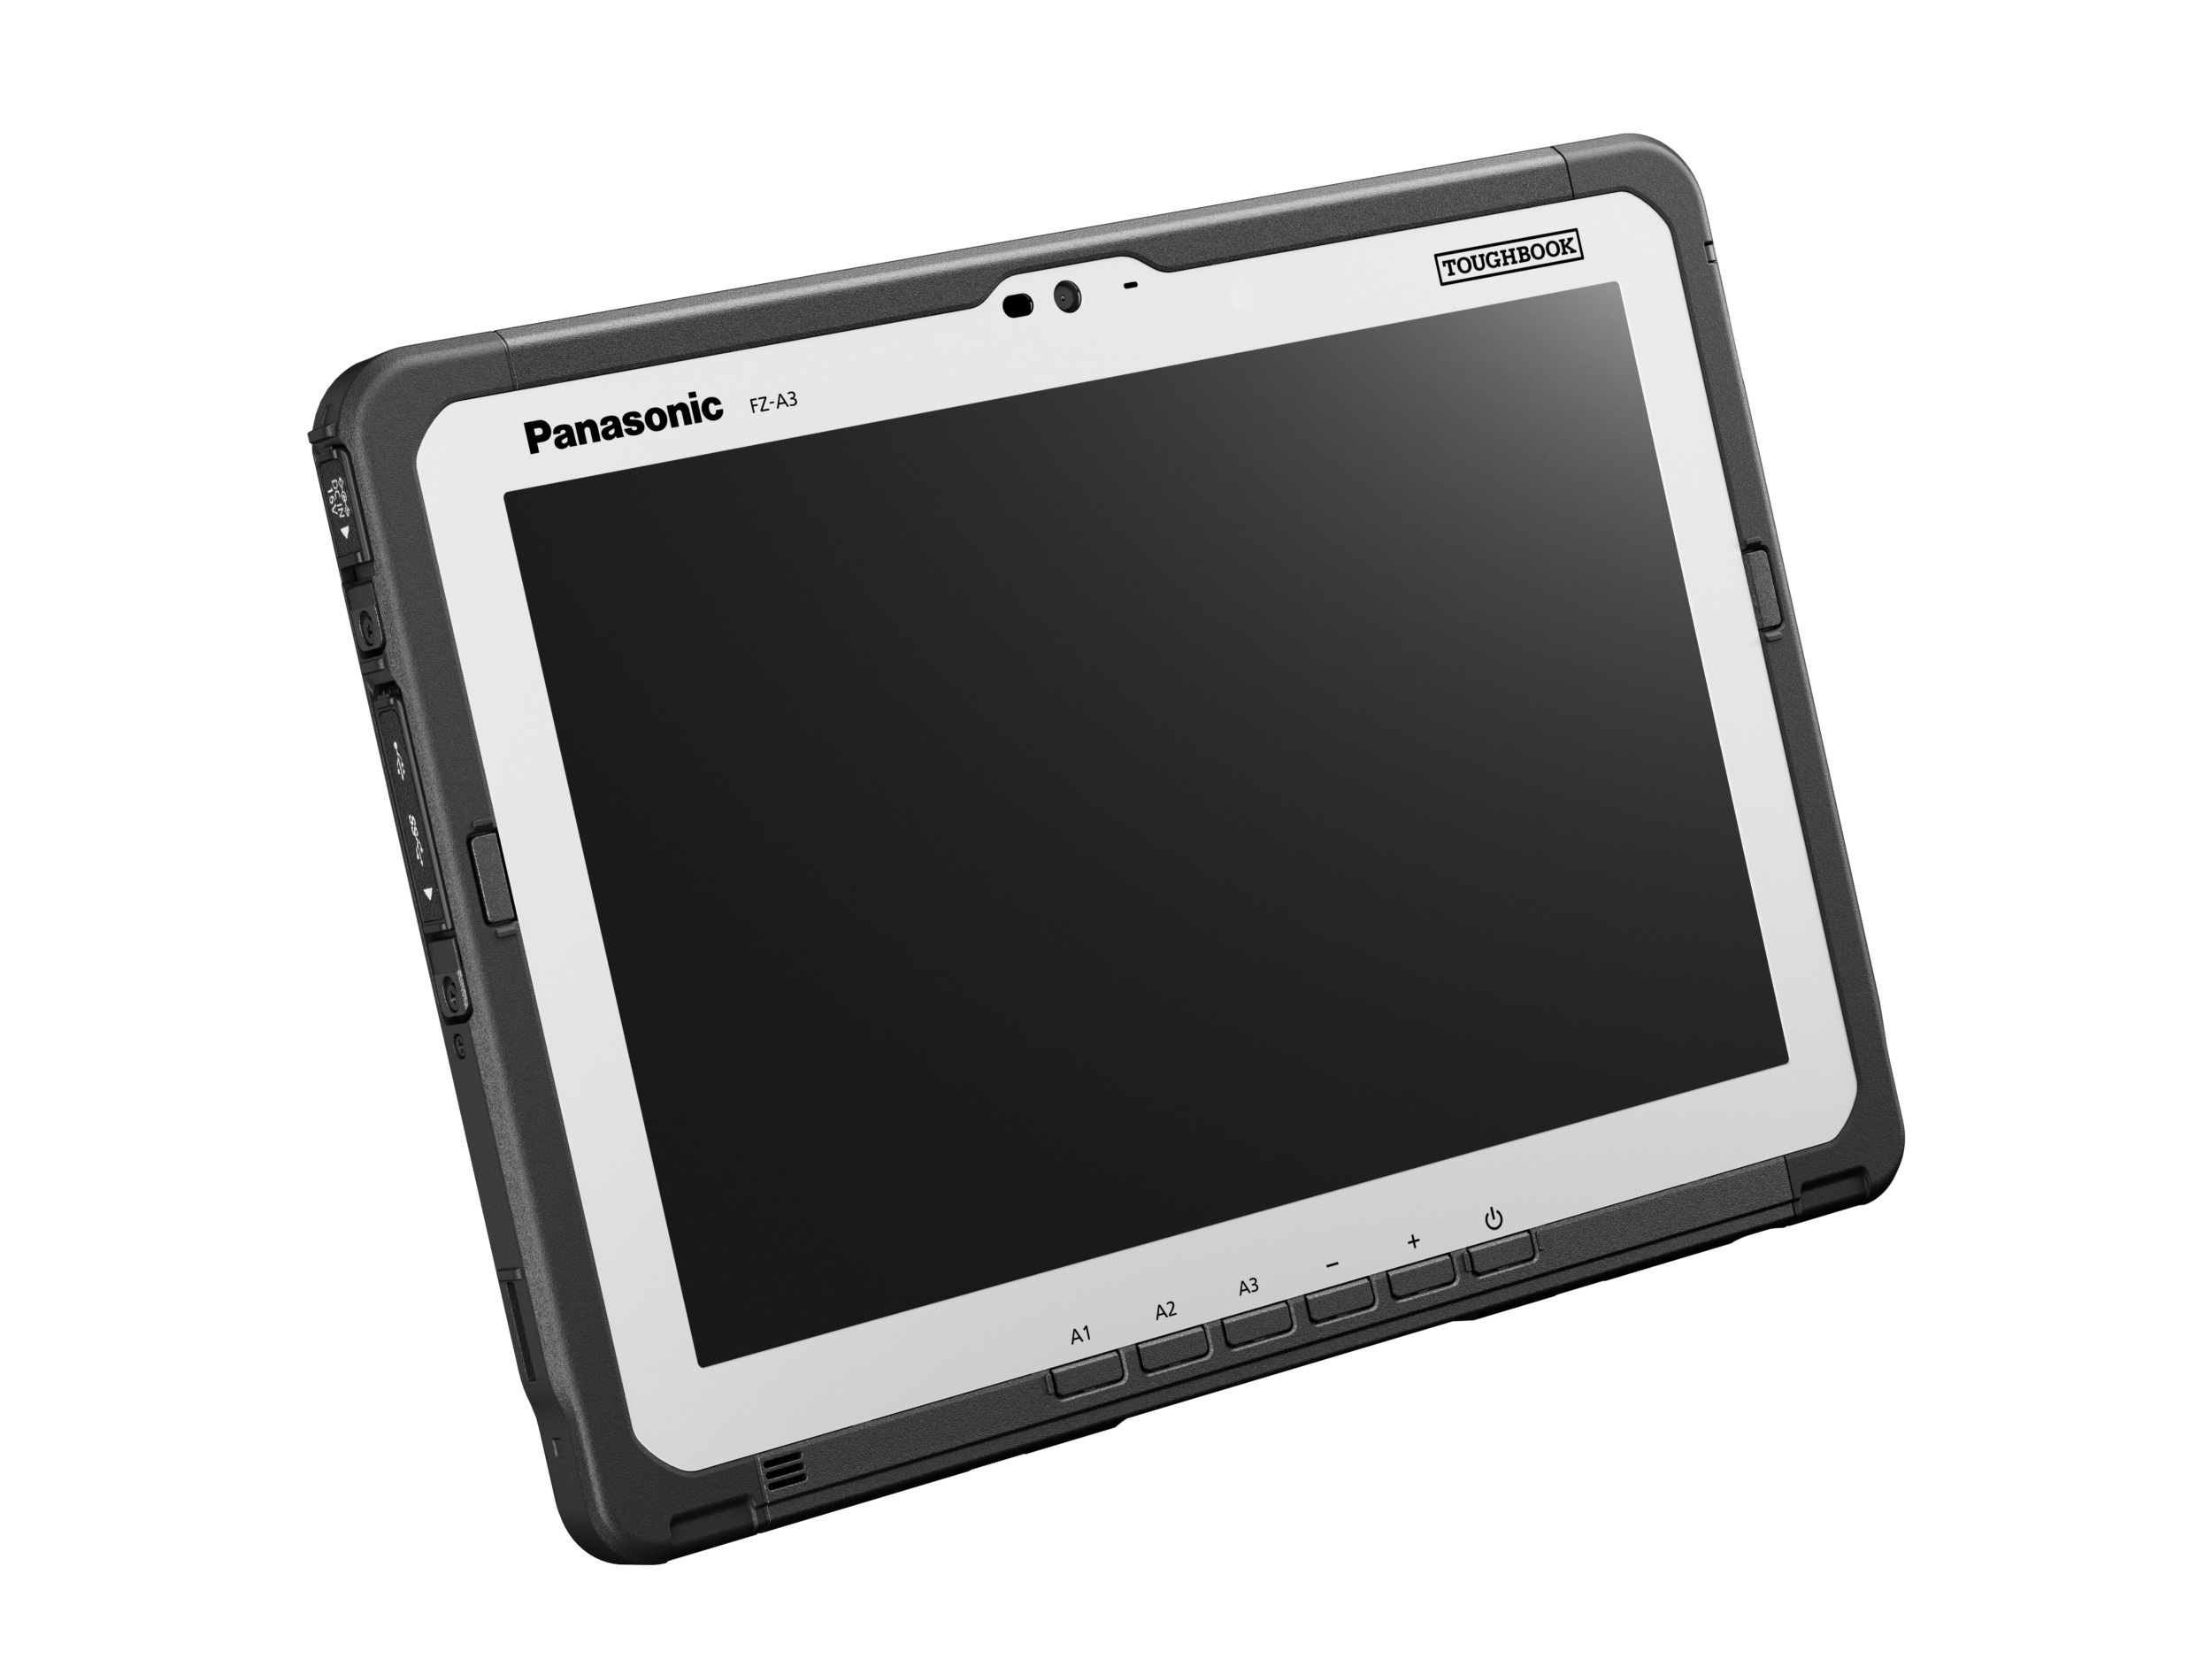 Panasonic Toughbook A3 4 6000x4500x